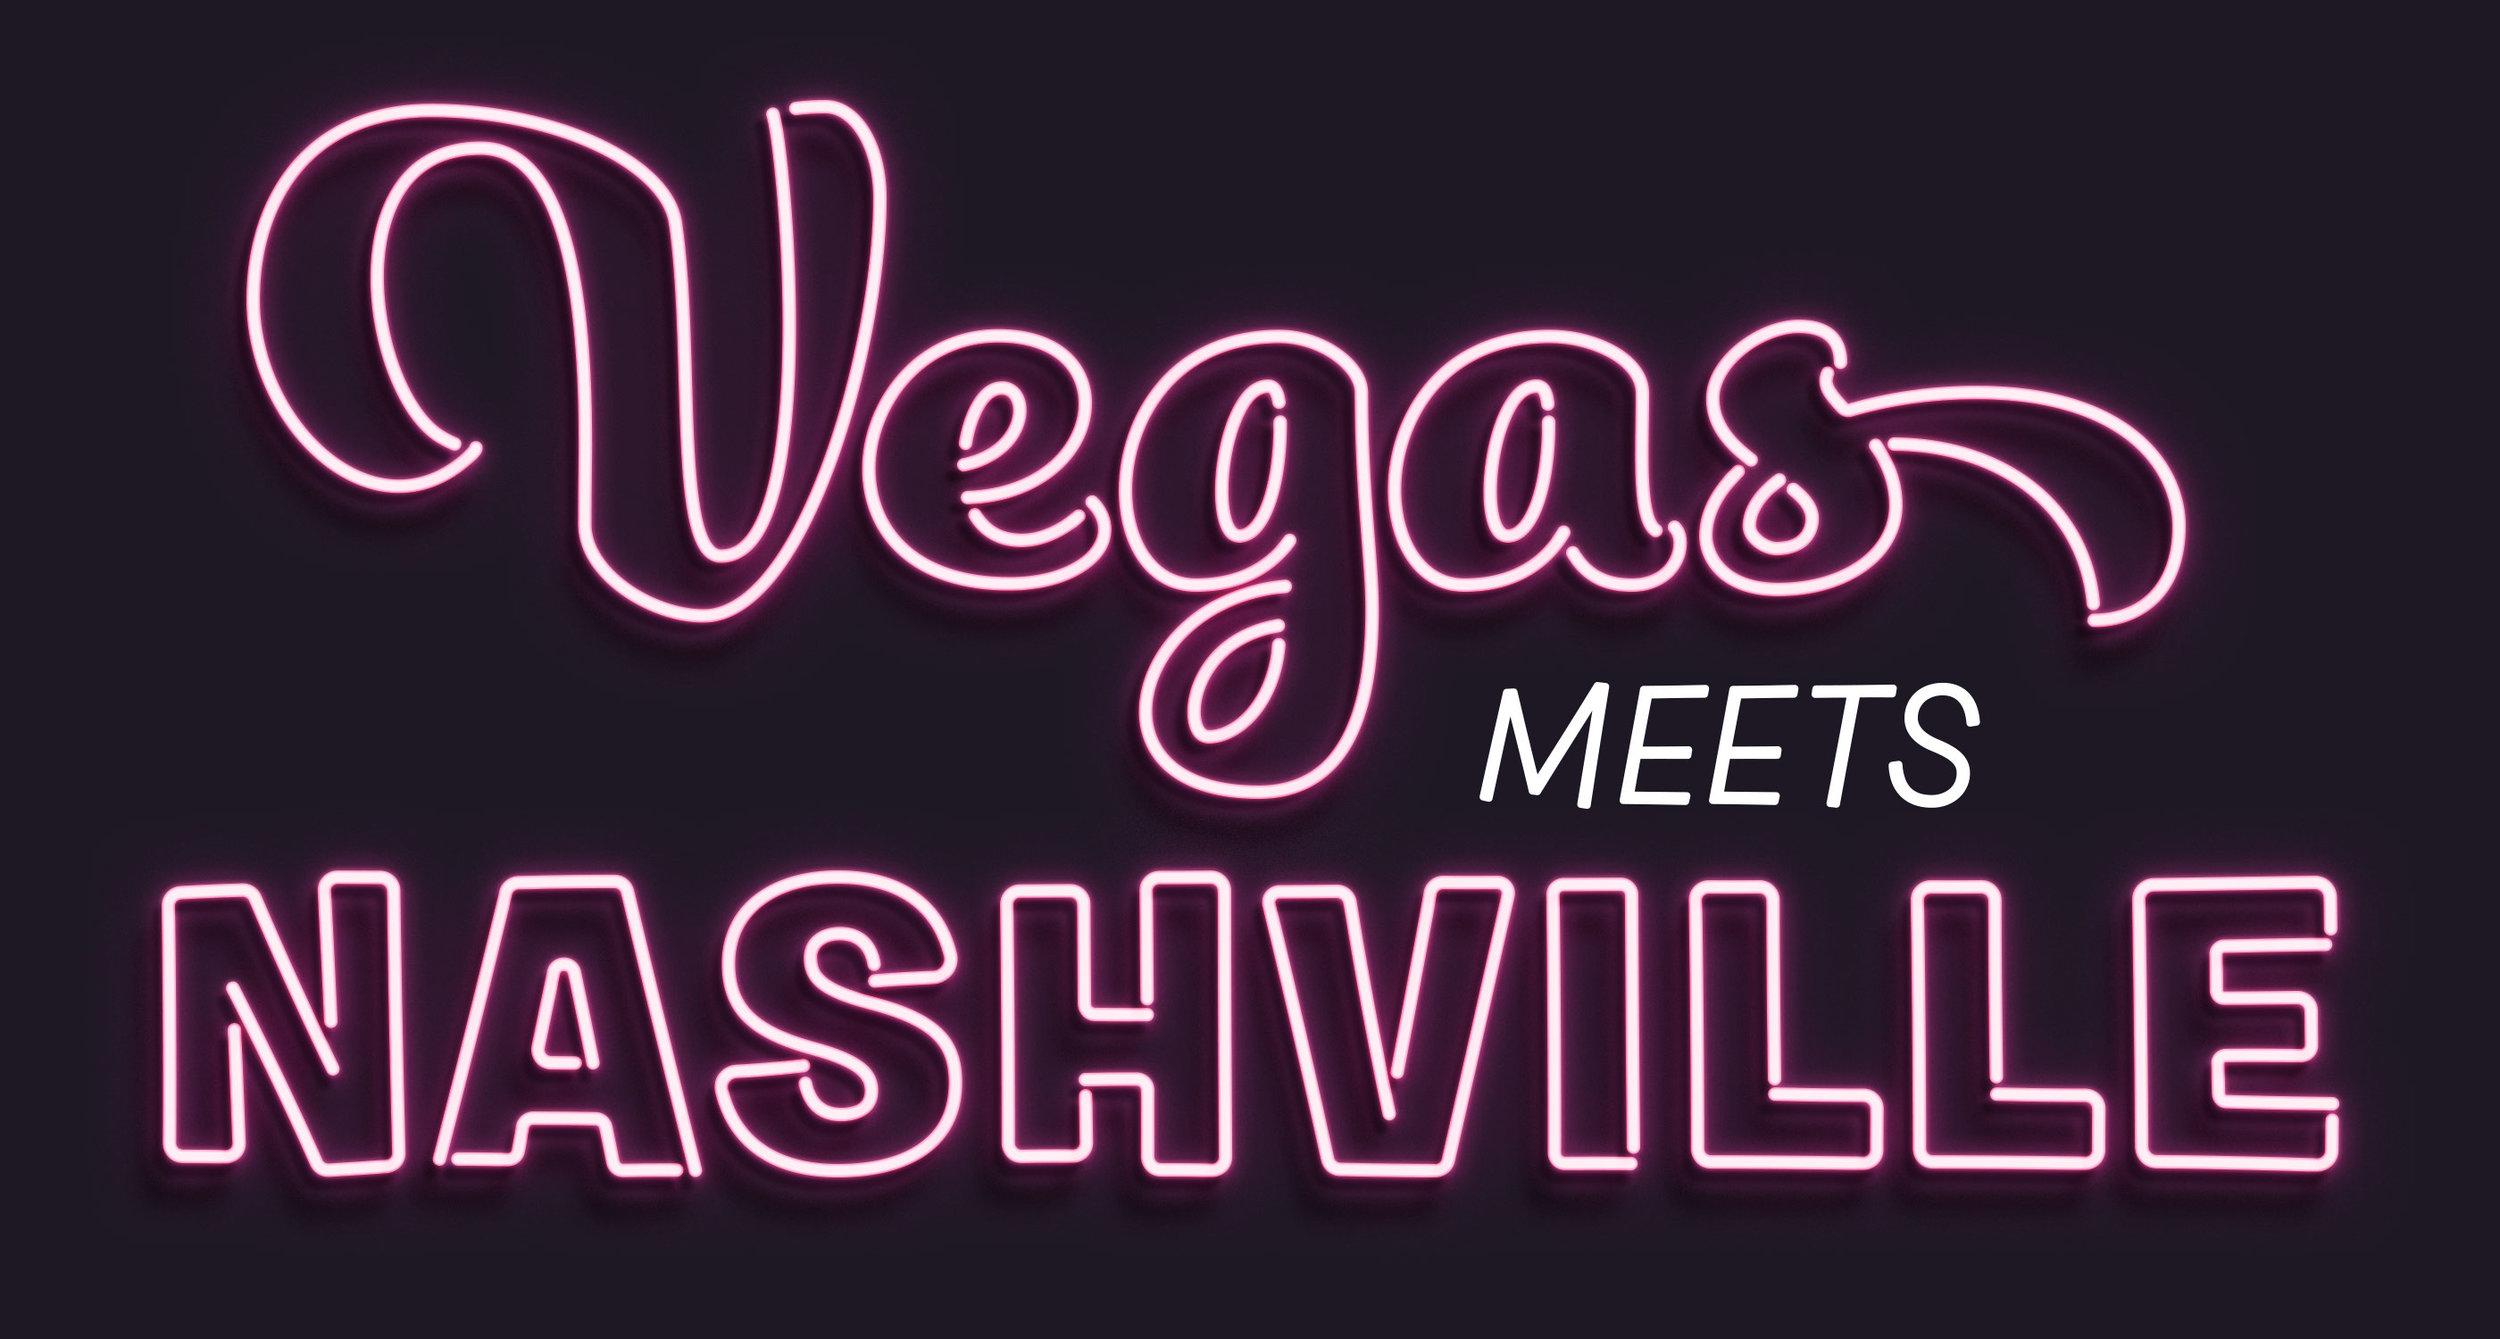 vegas-meets-nashville.jpg